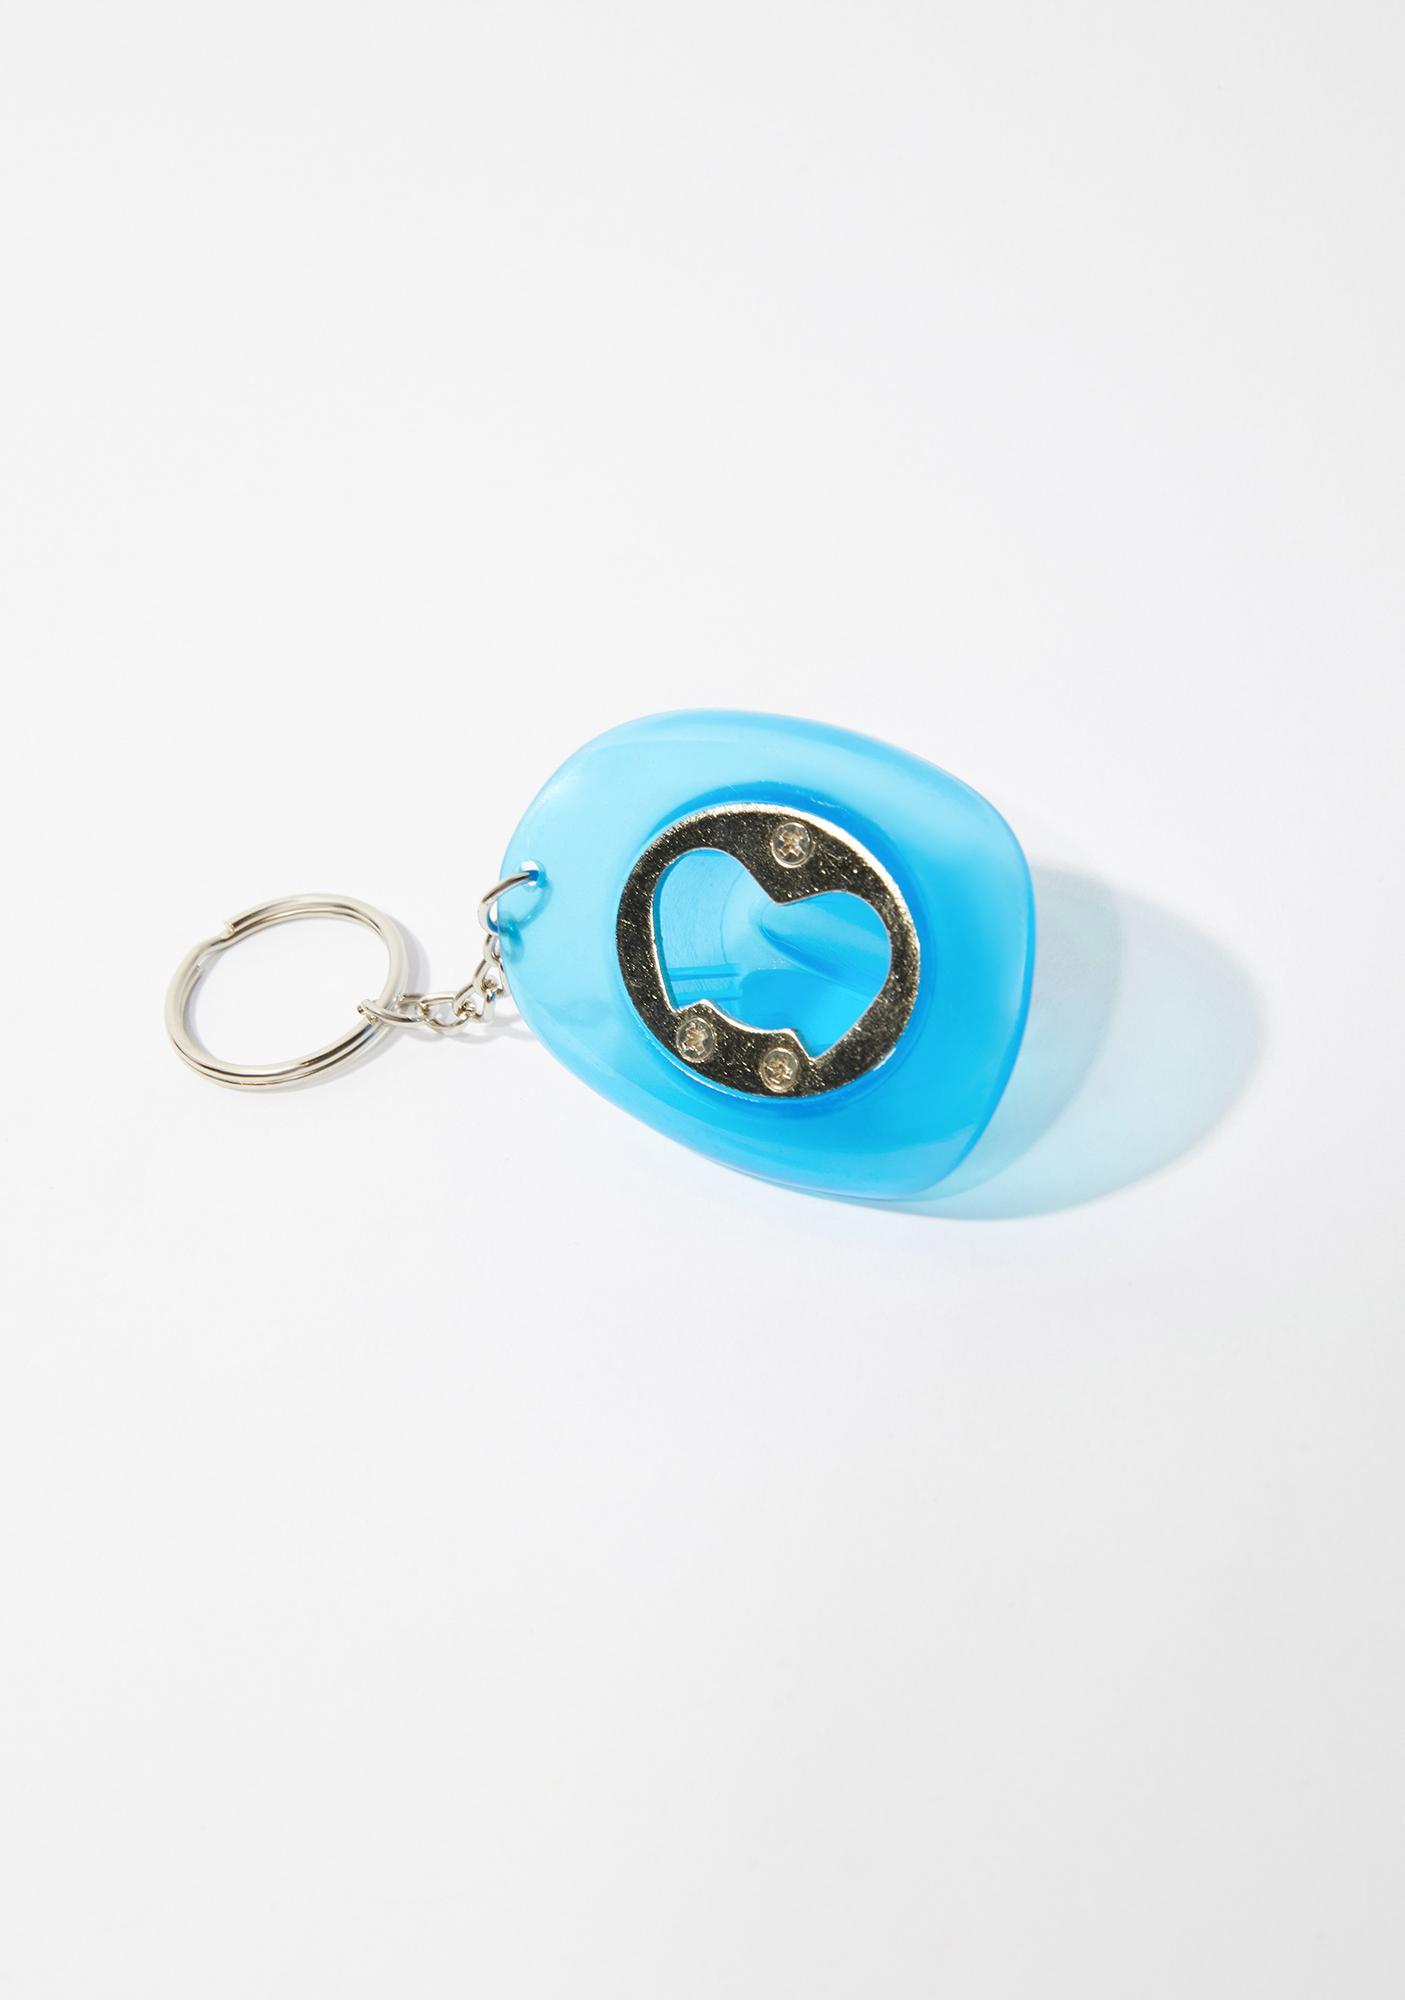 Neon Cowboys Blue Glow In The Dark Cowboy Hat Bottle Opener Keychain